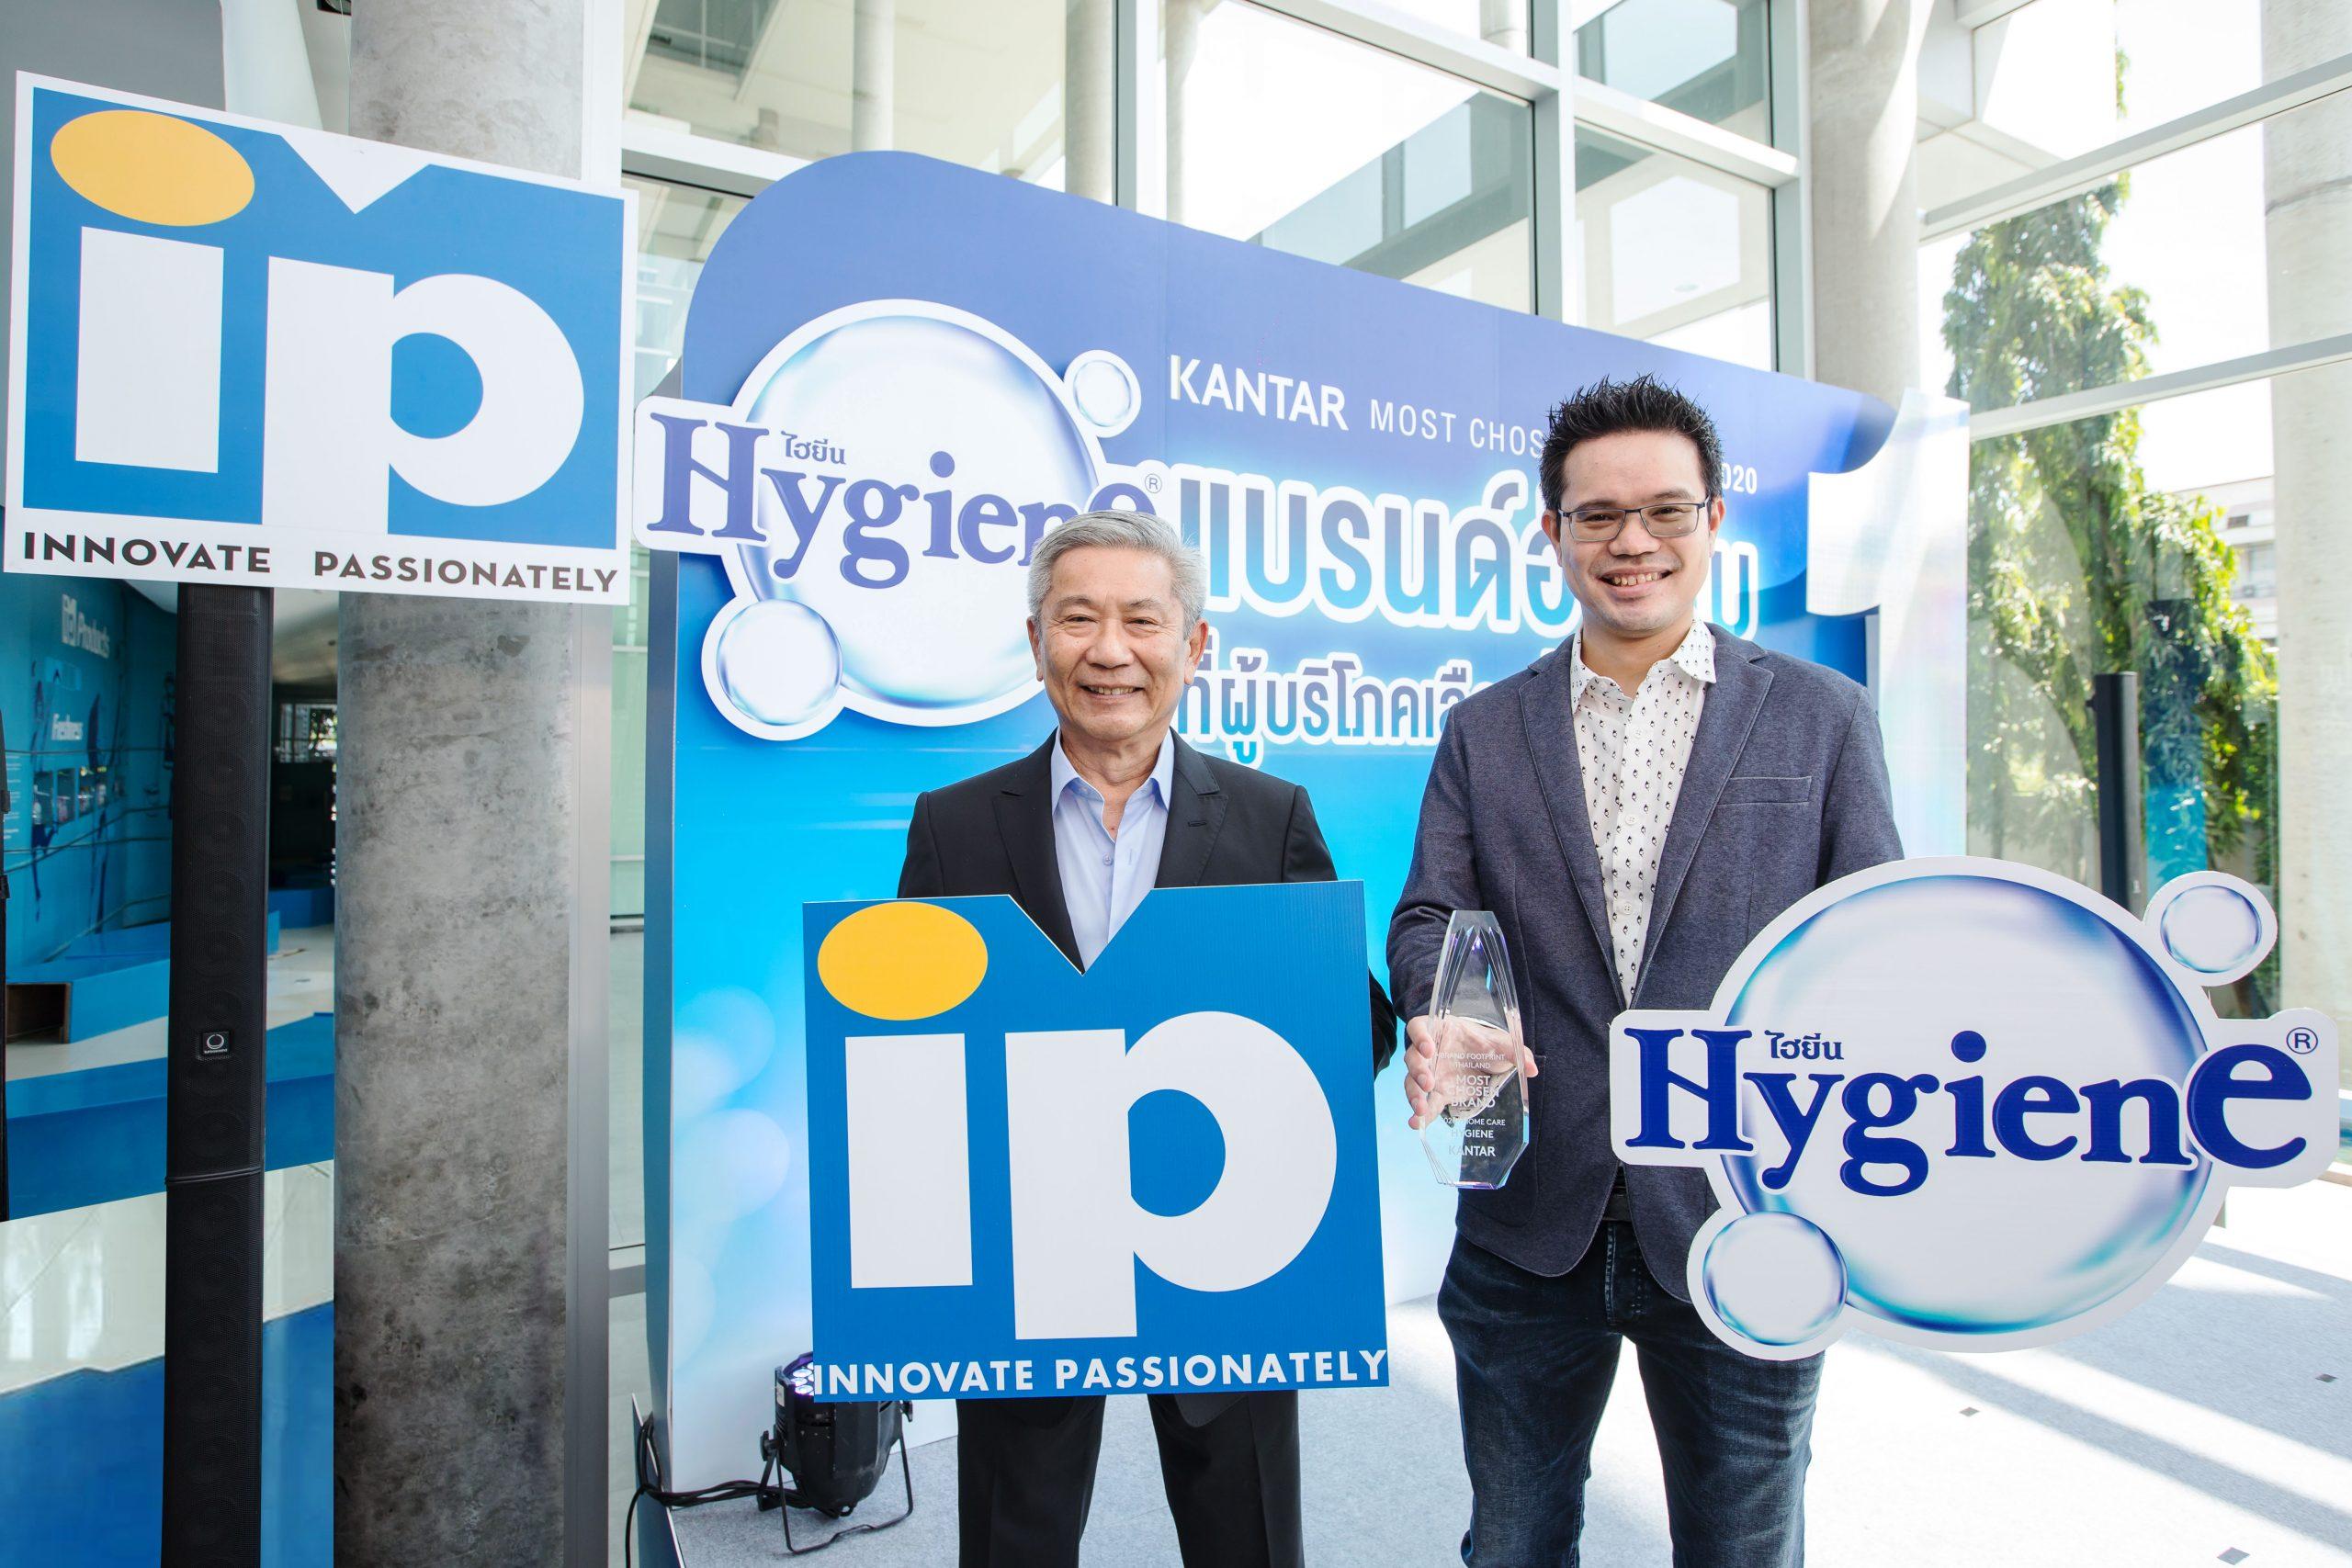 Hygiene IP KantarWorldpanelThailand KWP ไฮยีน